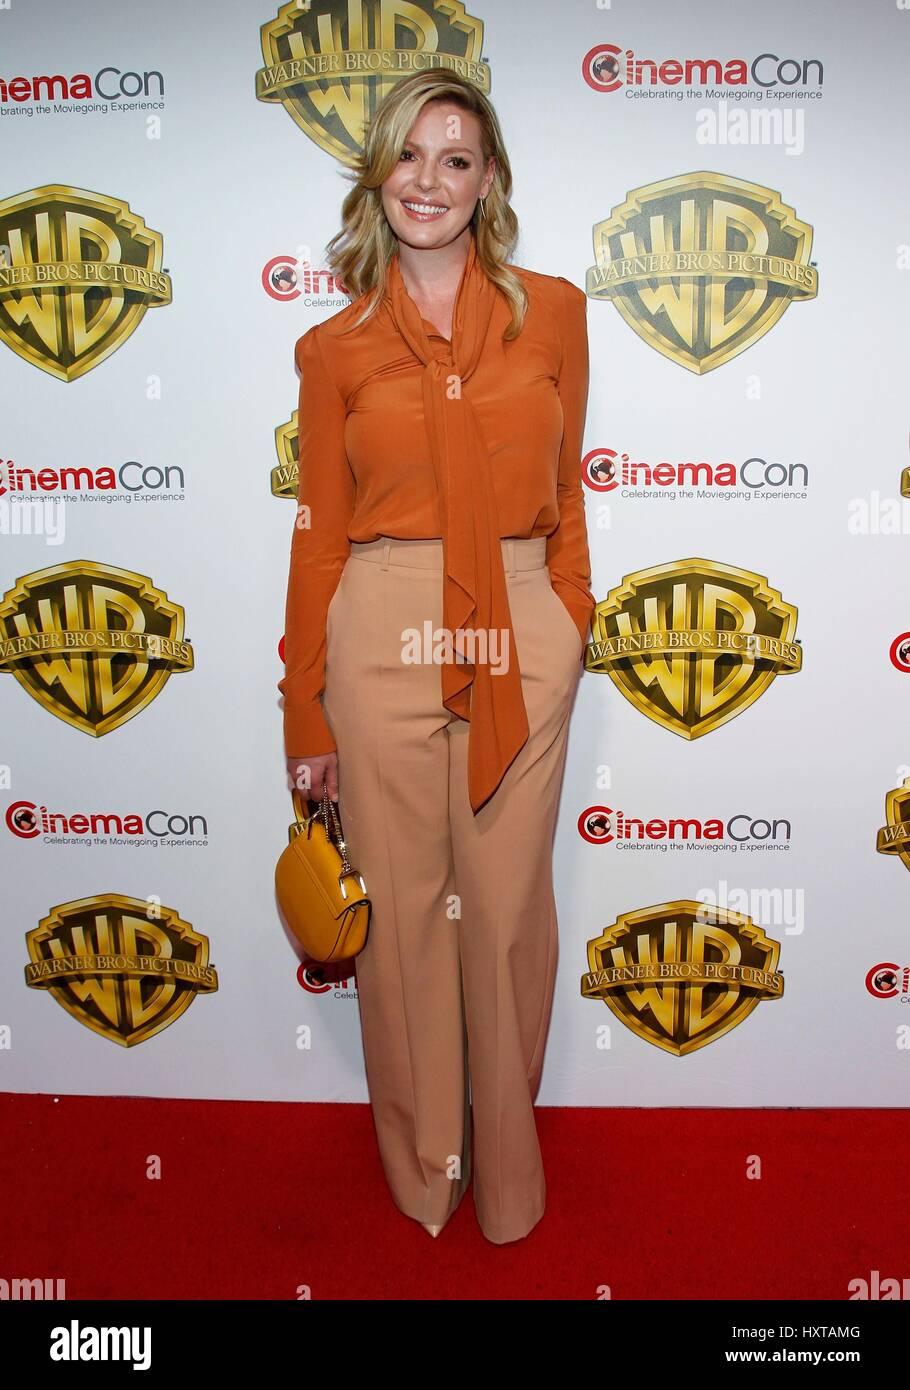 Las Vegas, NV, Stati Uniti d'America. 29 Mar, 2017. Katherine Heigl presso gli arrivi per Warner Bros Foto vi Immagini Stock